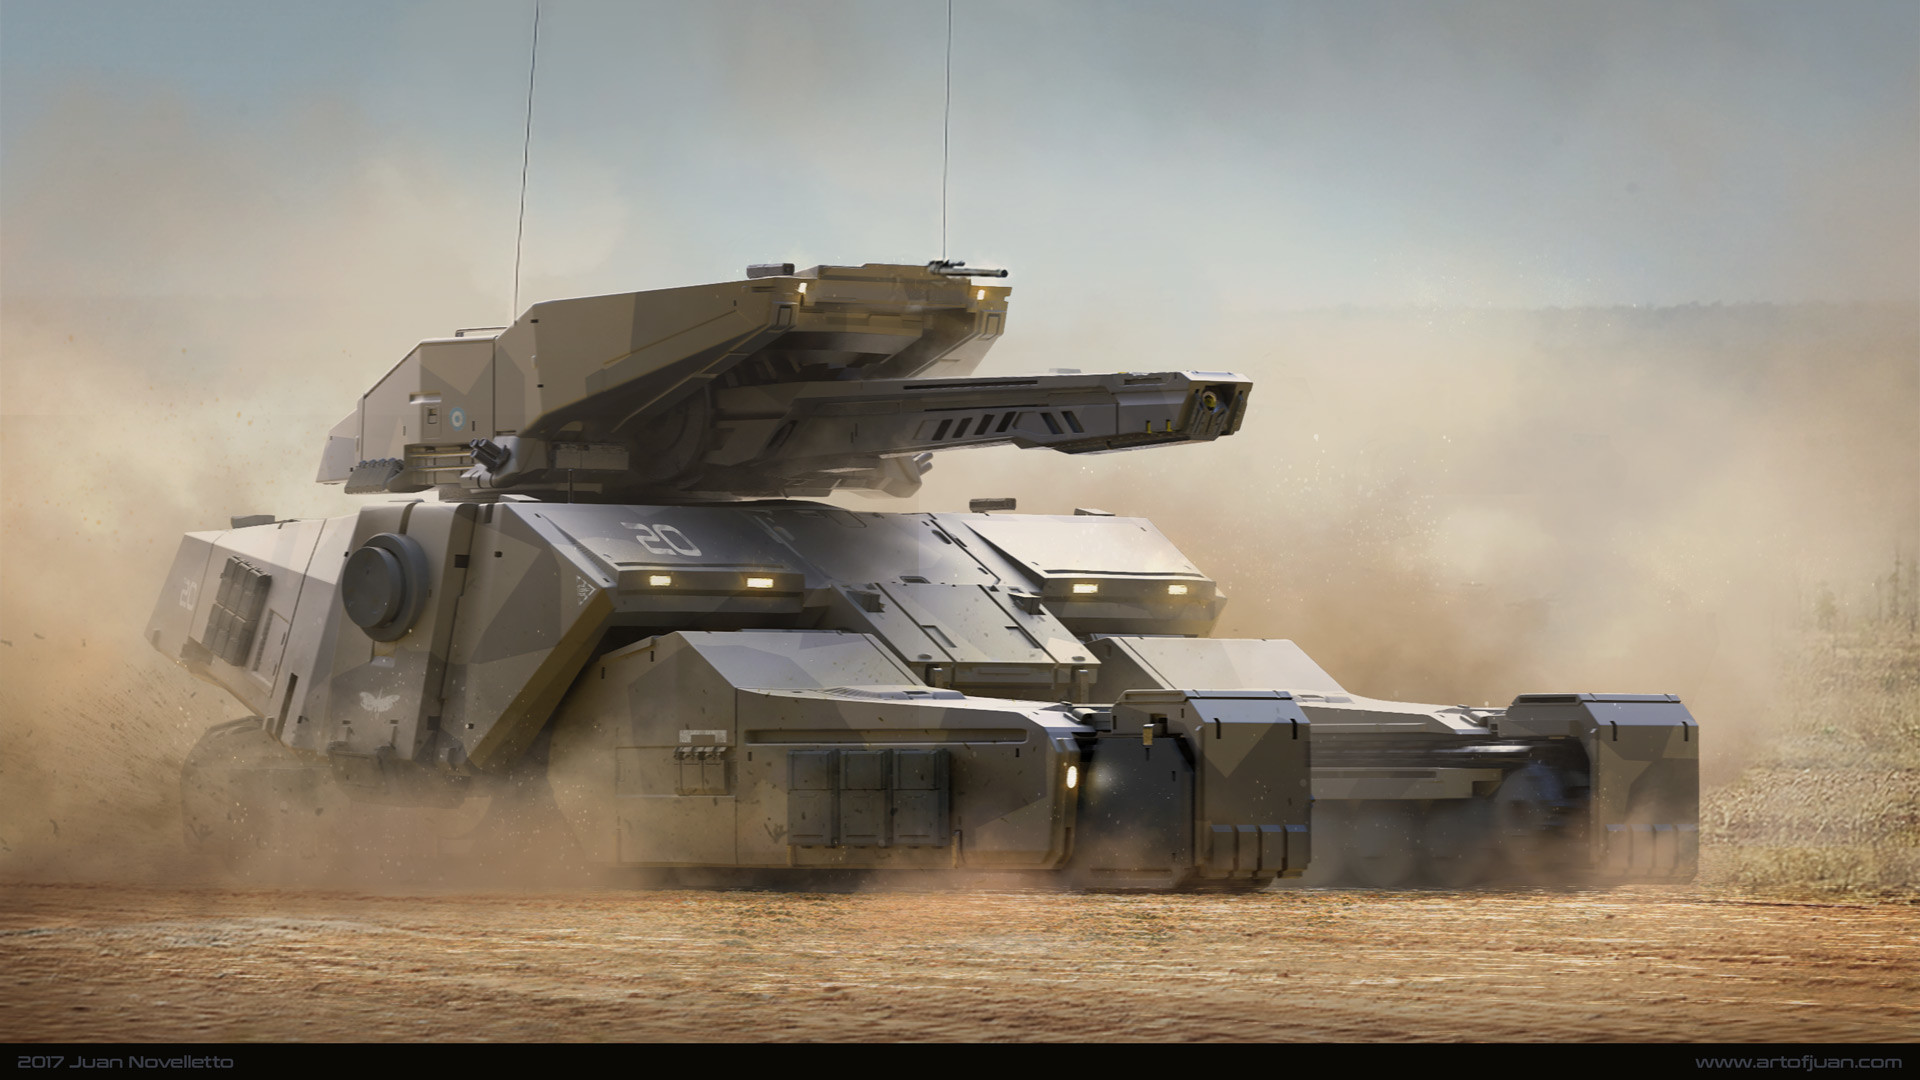 Juan novelletto tank01 arena